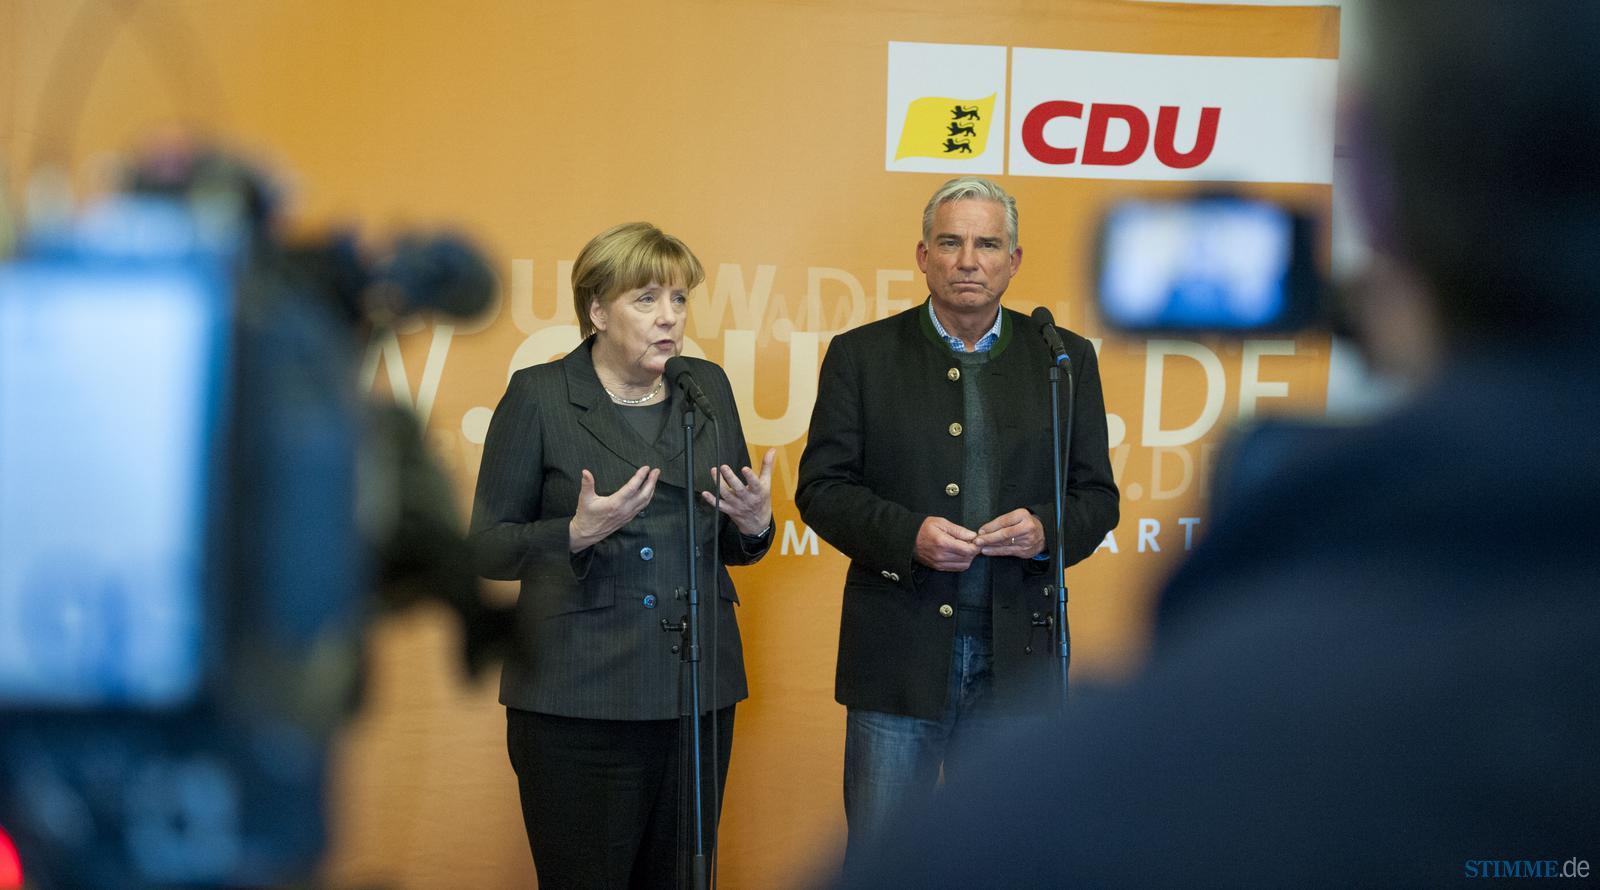 Меркел испраќа помирливи сигнали кон Вашингтон